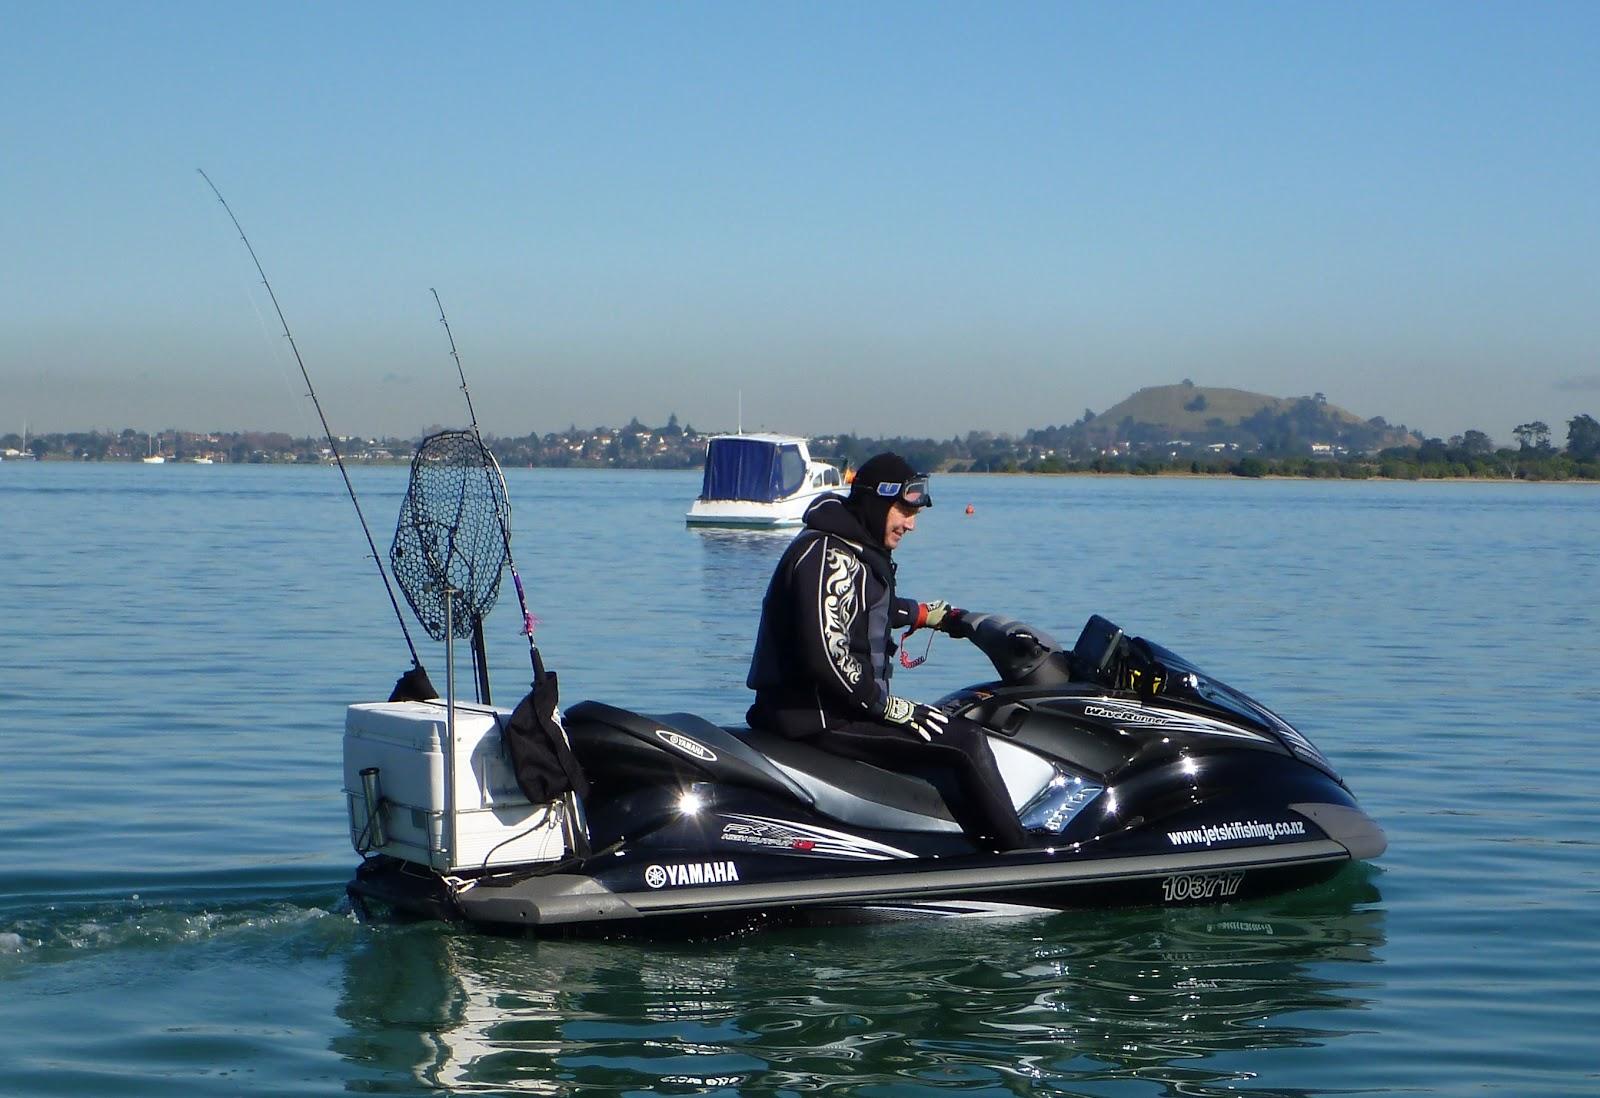 Jet ski fishing blog july 2012 for Jet ski fishing accessories